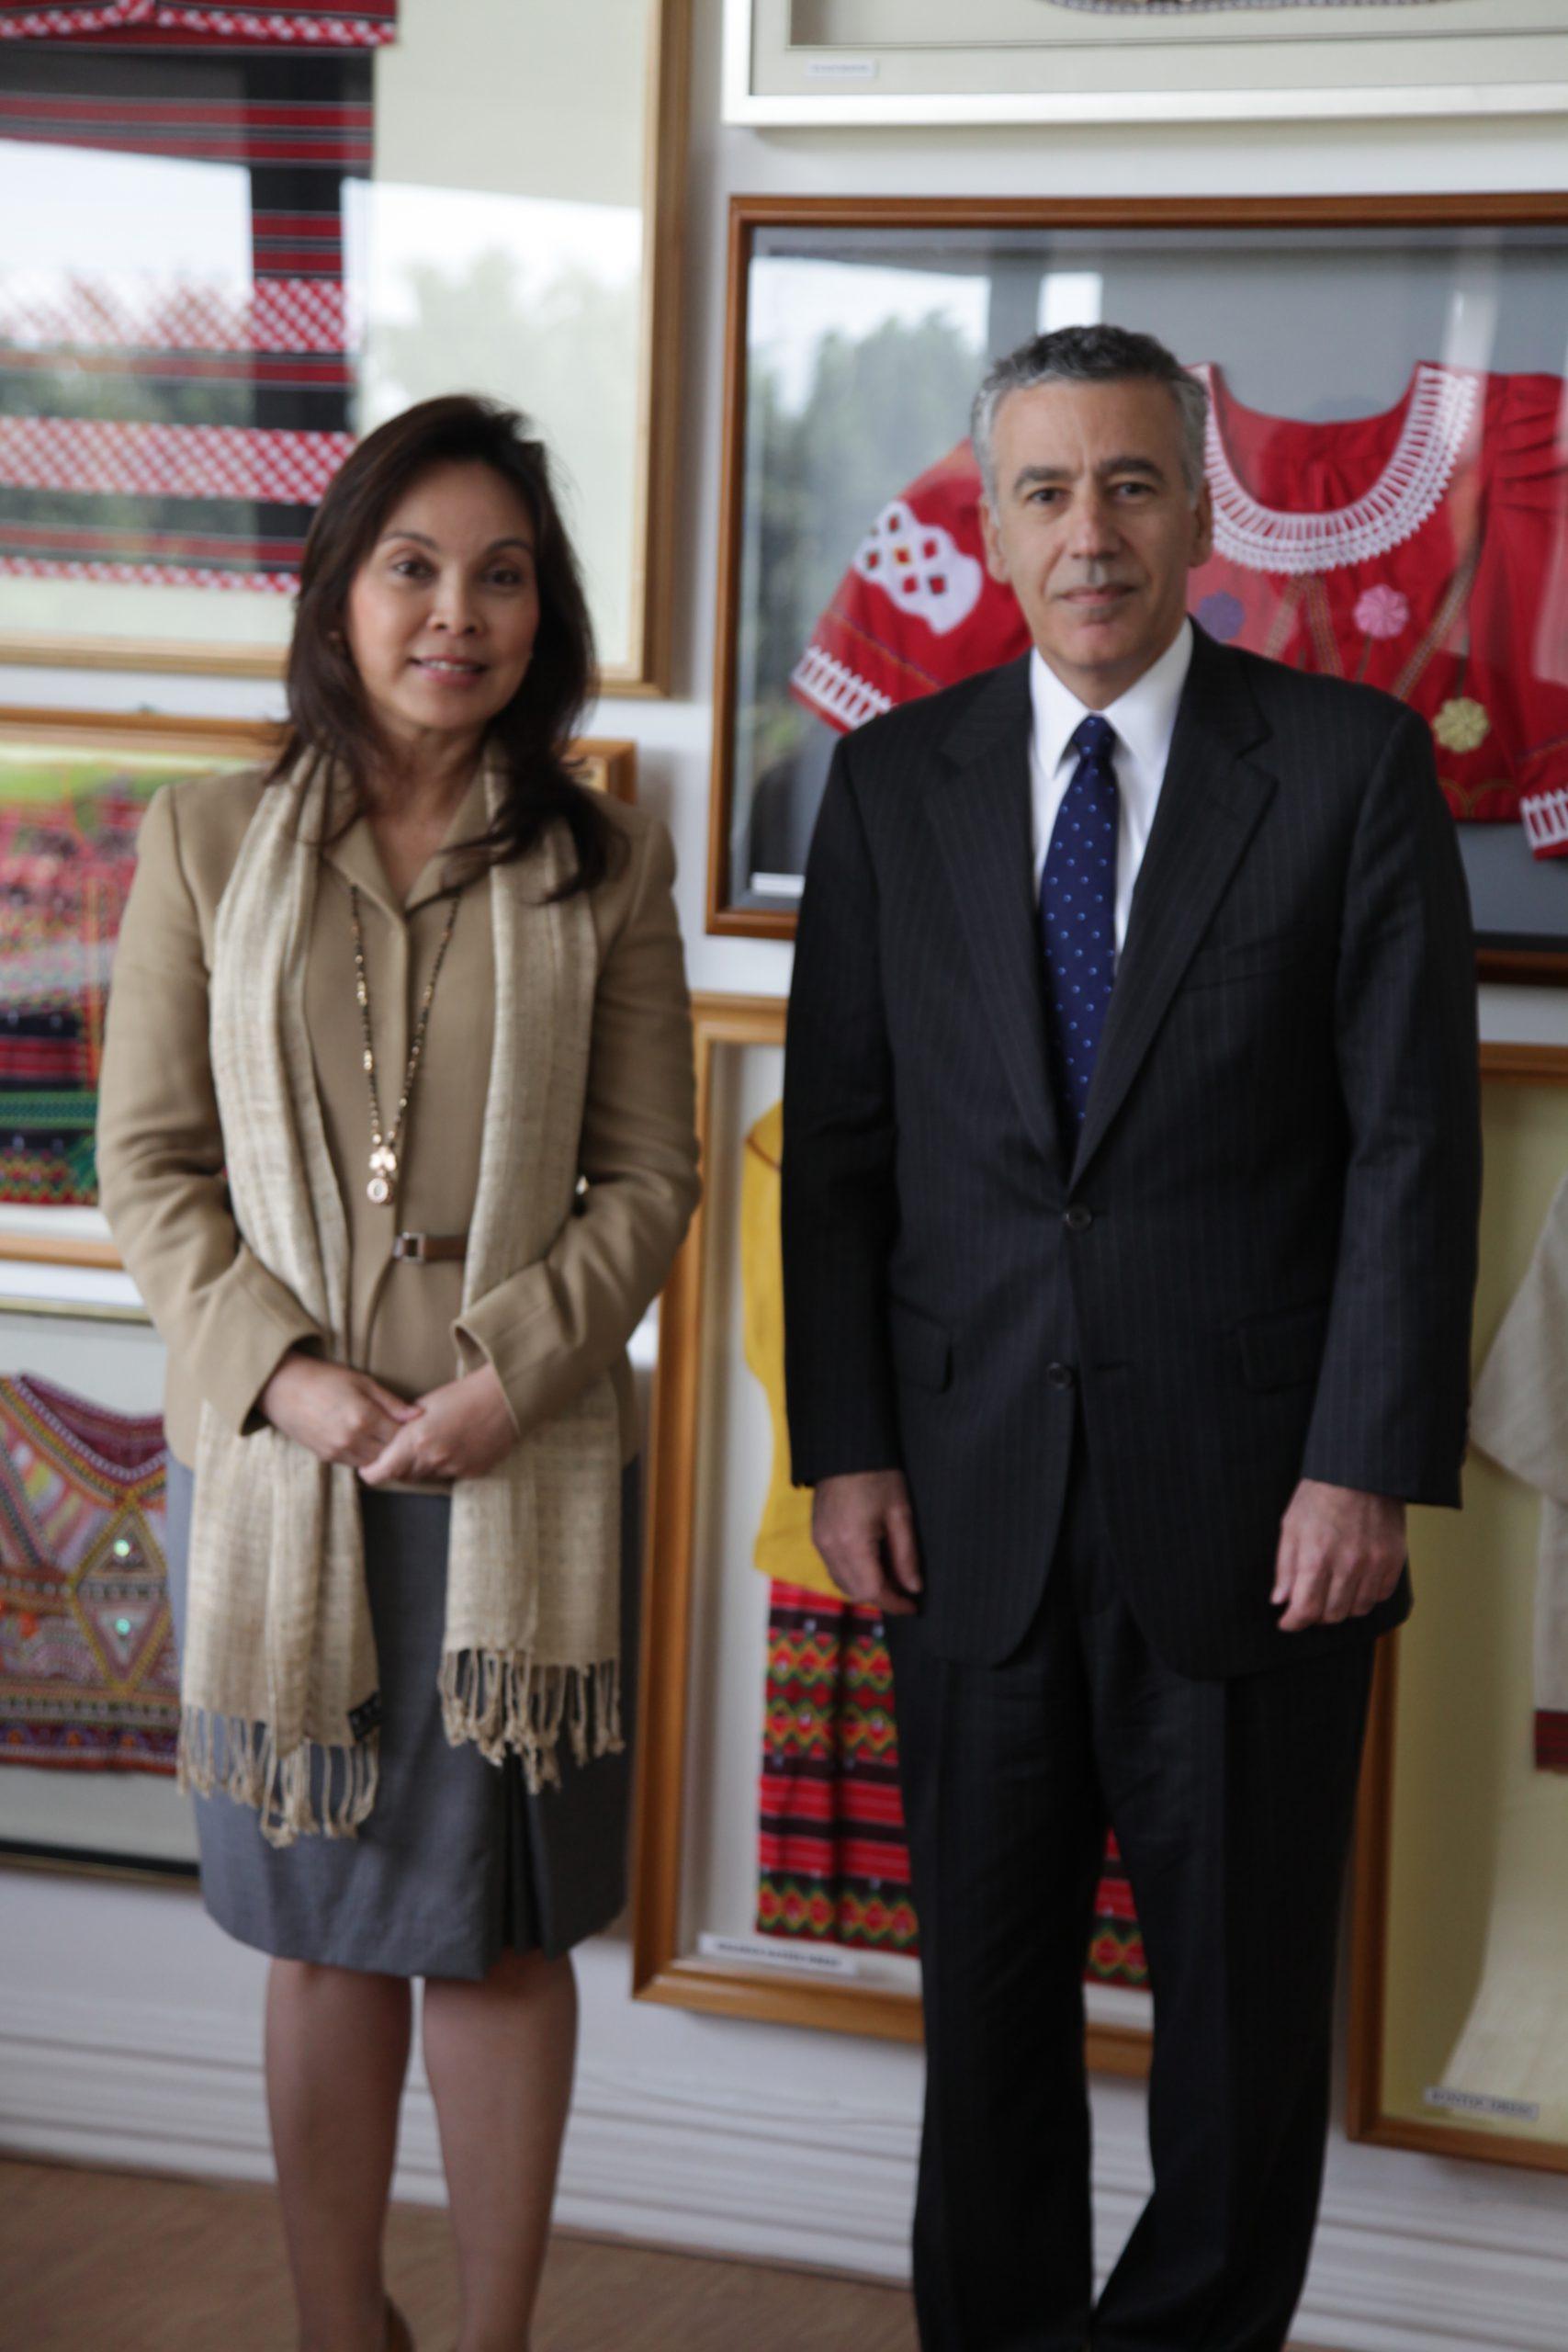 Senator Legarda with US Ambassador Philip S. Goldberg